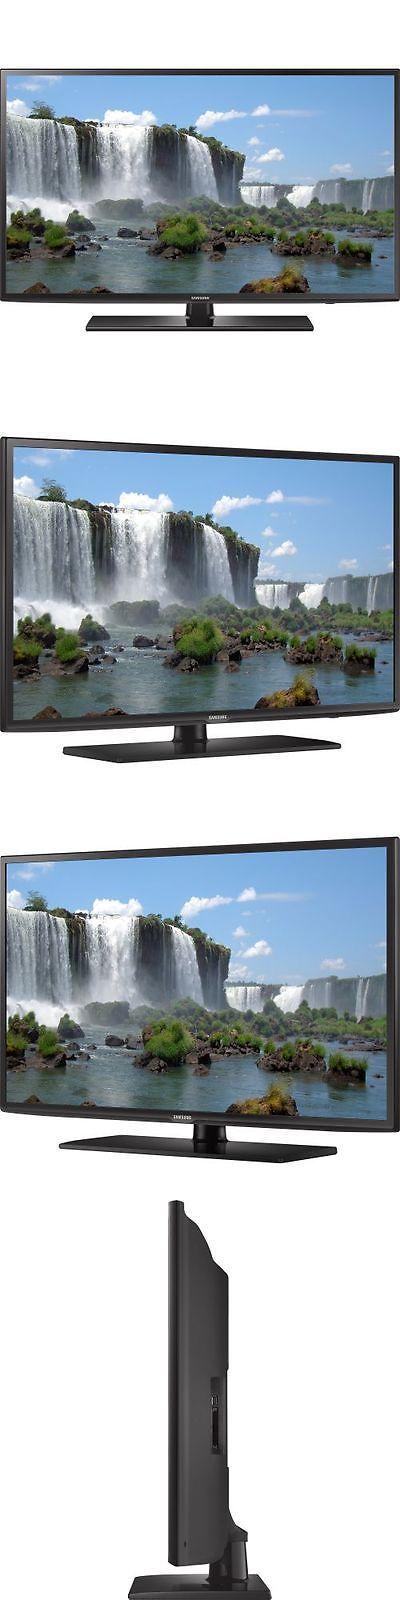 samsung un55h6350 55-inch 1080p smart led tv